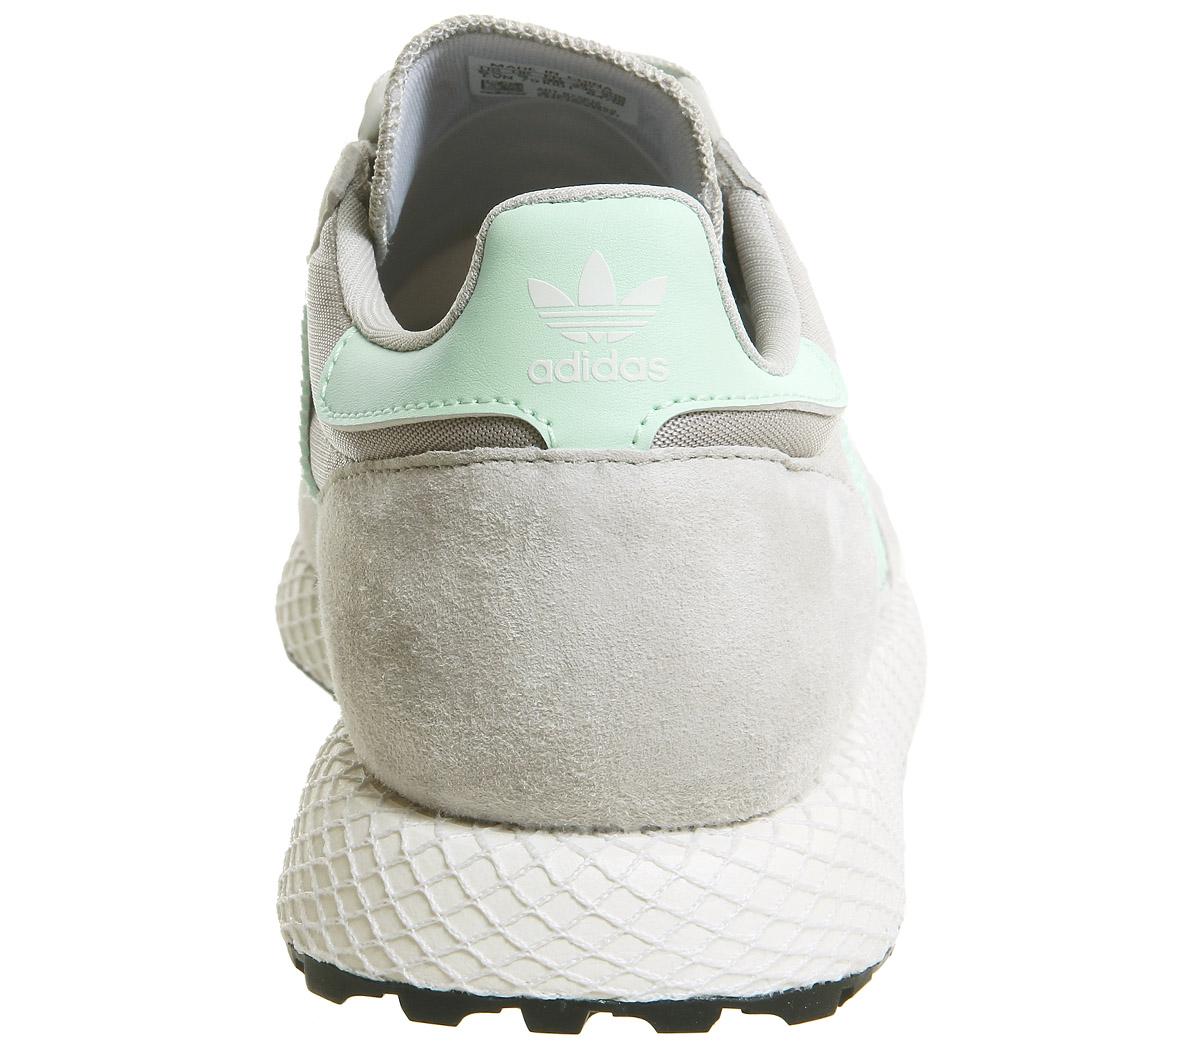 finest selection 75626 74a59 SENTINEL Womens Adidas Forest Grove formatori sesamo nero scarpe da  ginnastica scarpe bianco. SENTINEL Thumbnail 5